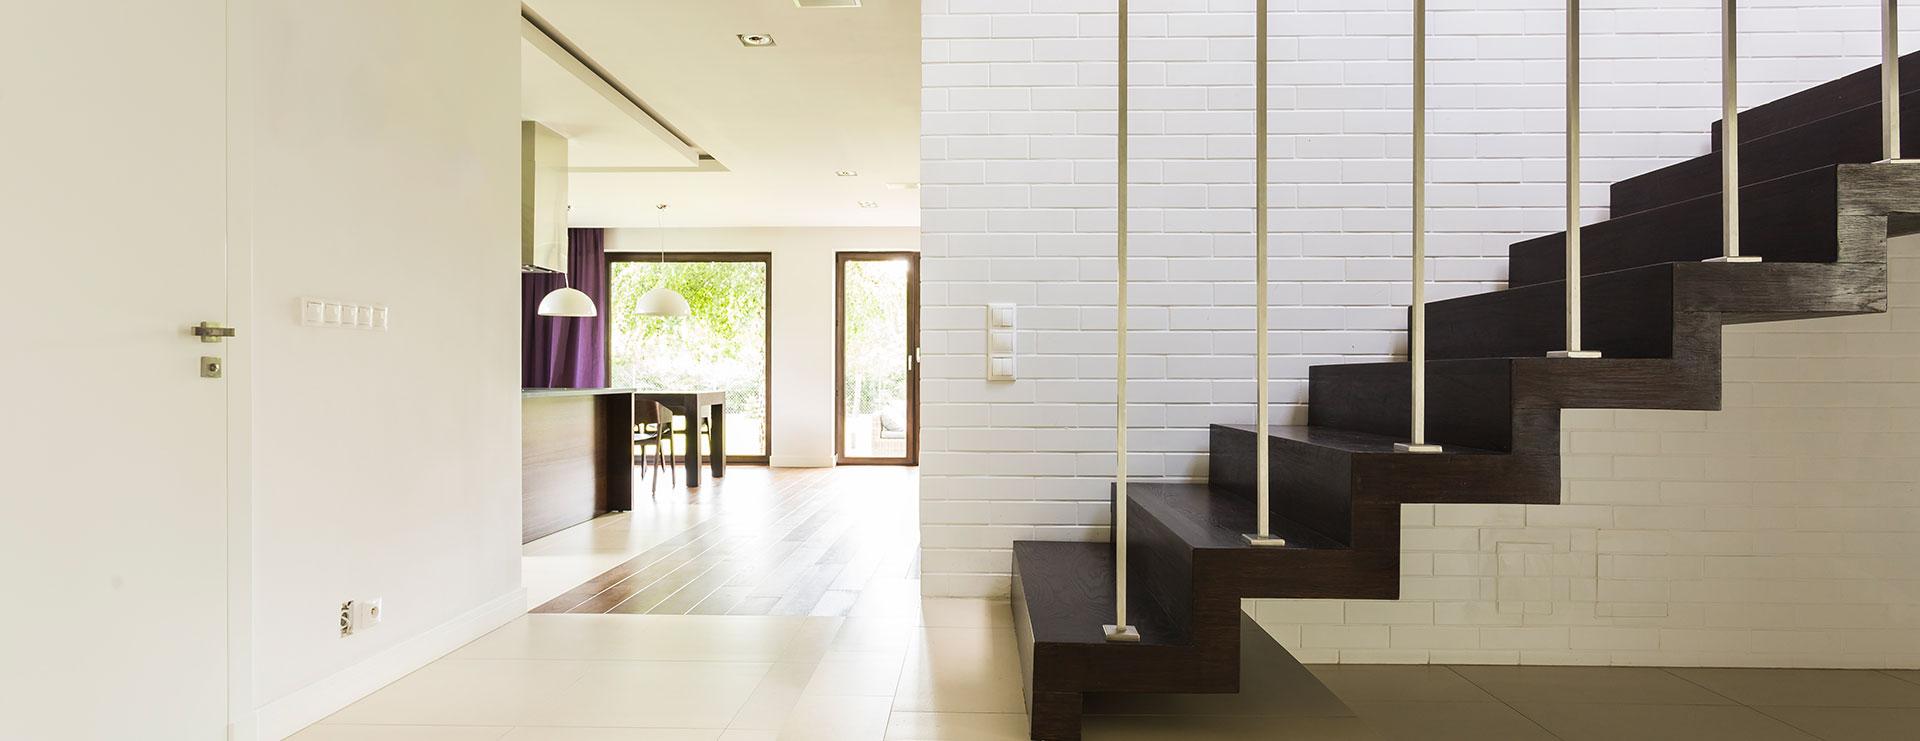 renovation porte interieur habillage perfect prparation du support with renovation porte. Black Bedroom Furniture Sets. Home Design Ideas